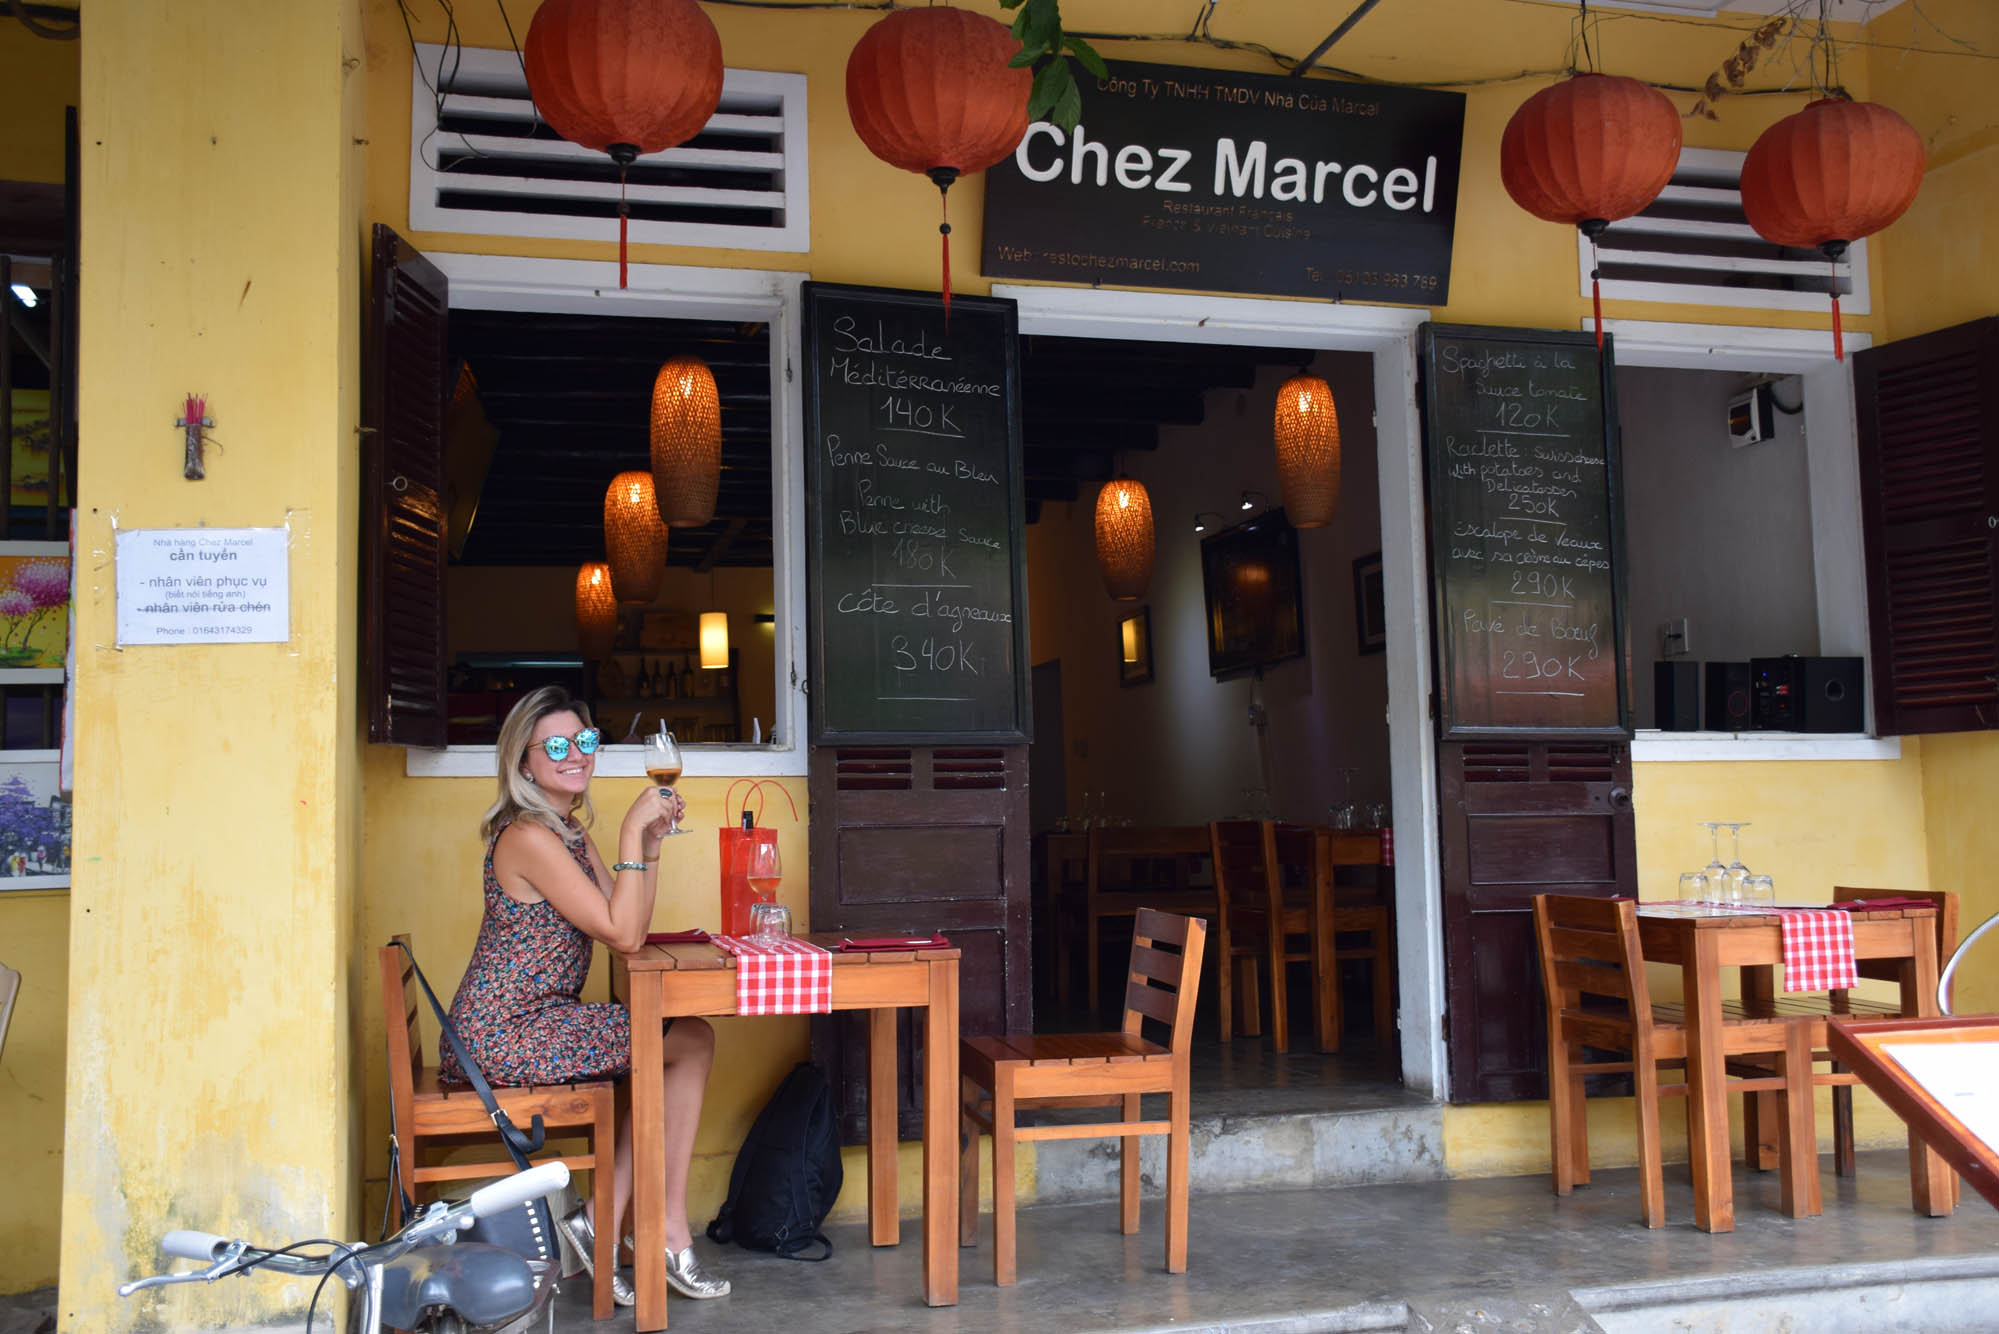 Restaurante Chez Marcel, em Hoi An